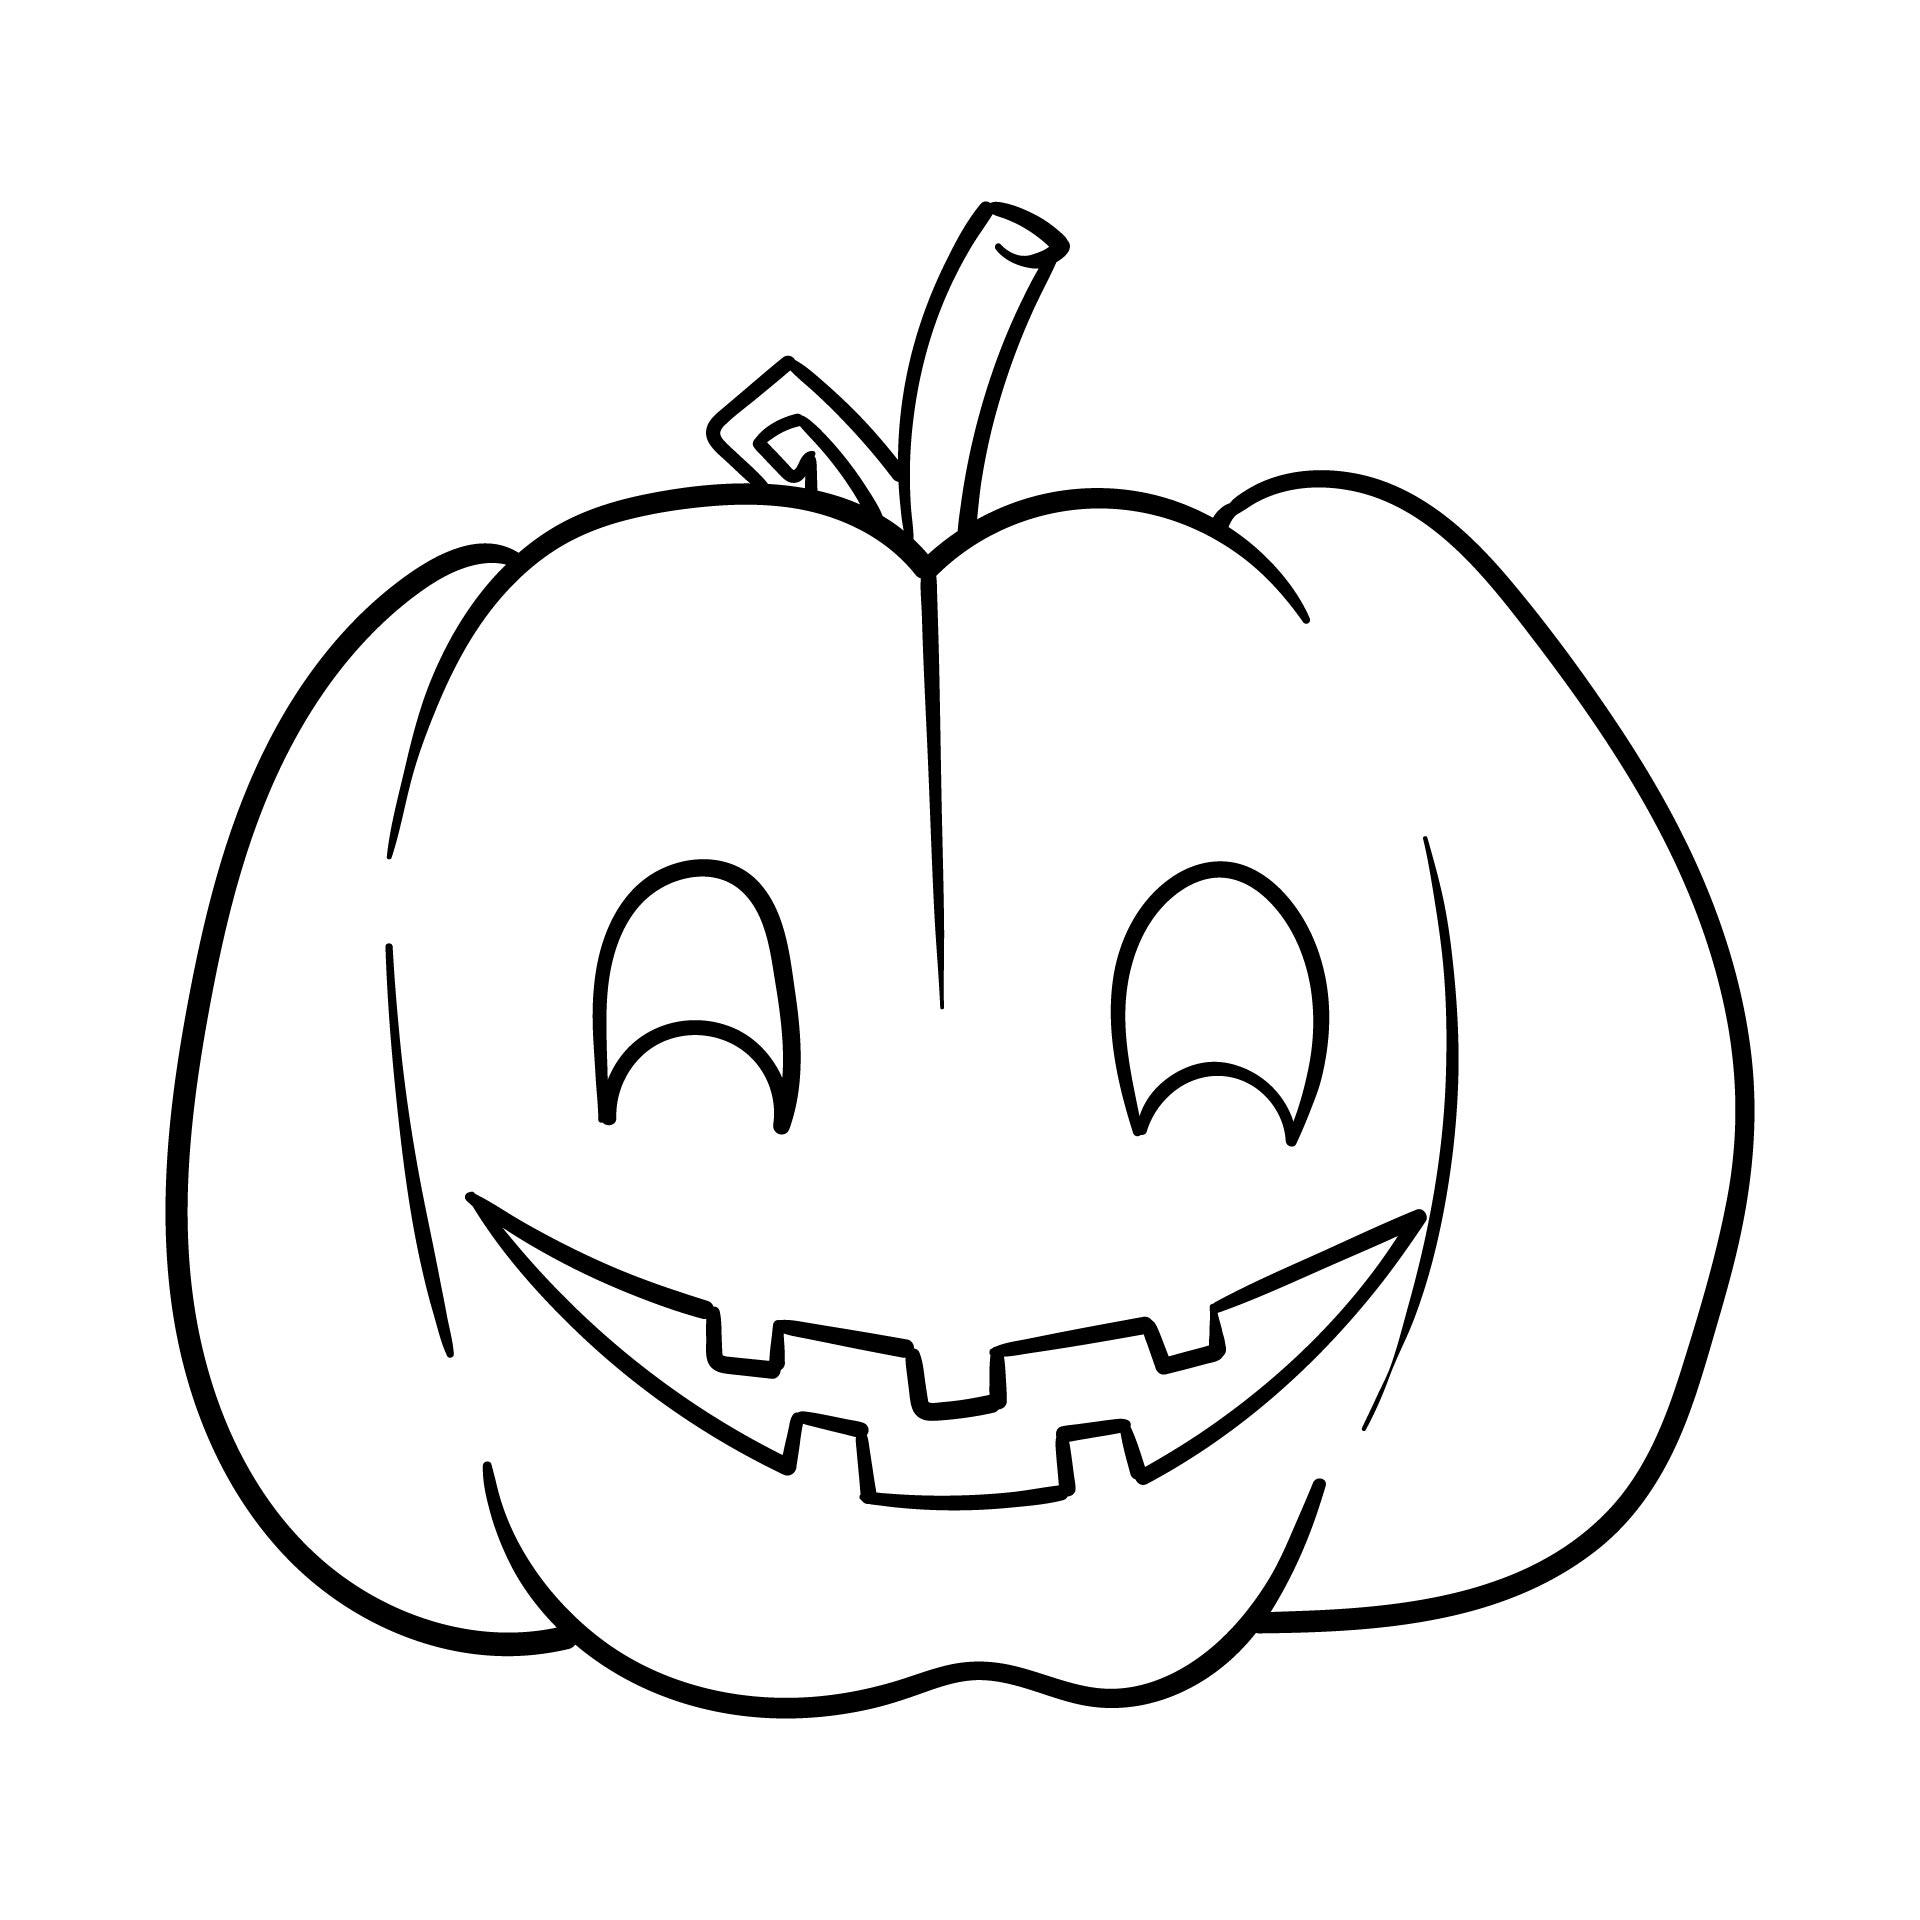 Printable Halloween Pumpkin Kids Coloring Pages